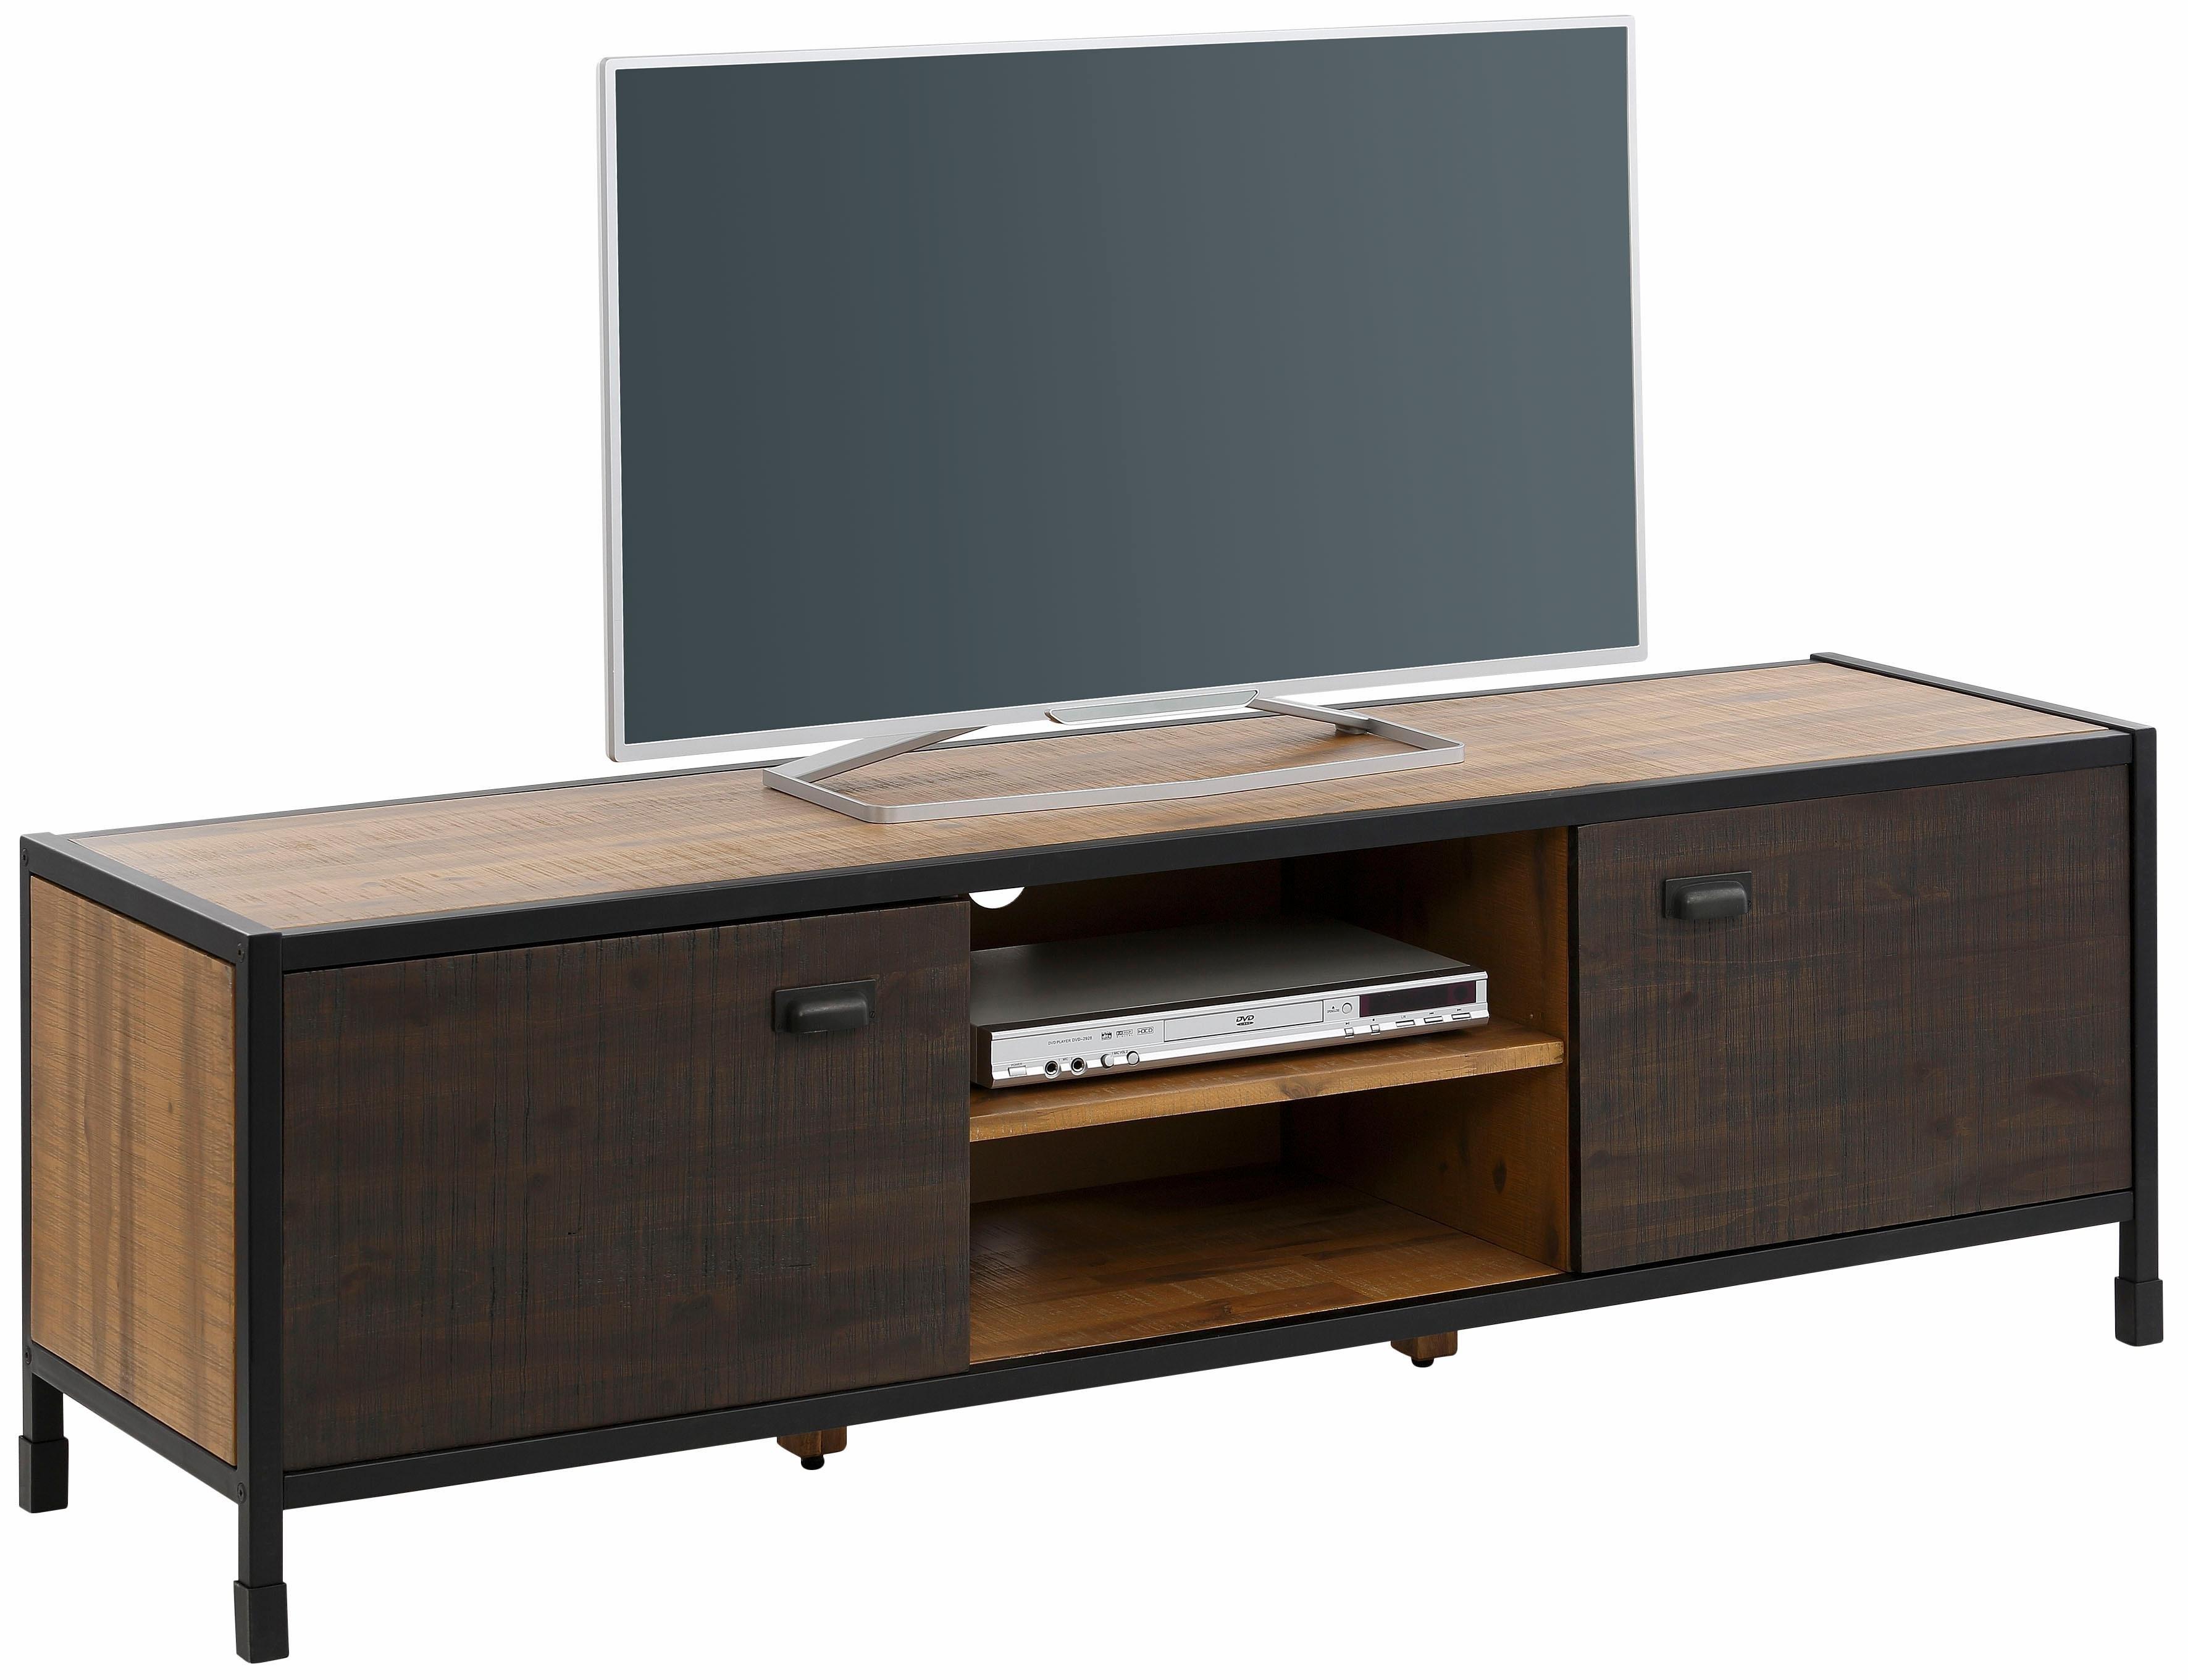 home affaire tv meubel soho breedte 165 cm online bij otto. Black Bedroom Furniture Sets. Home Design Ideas